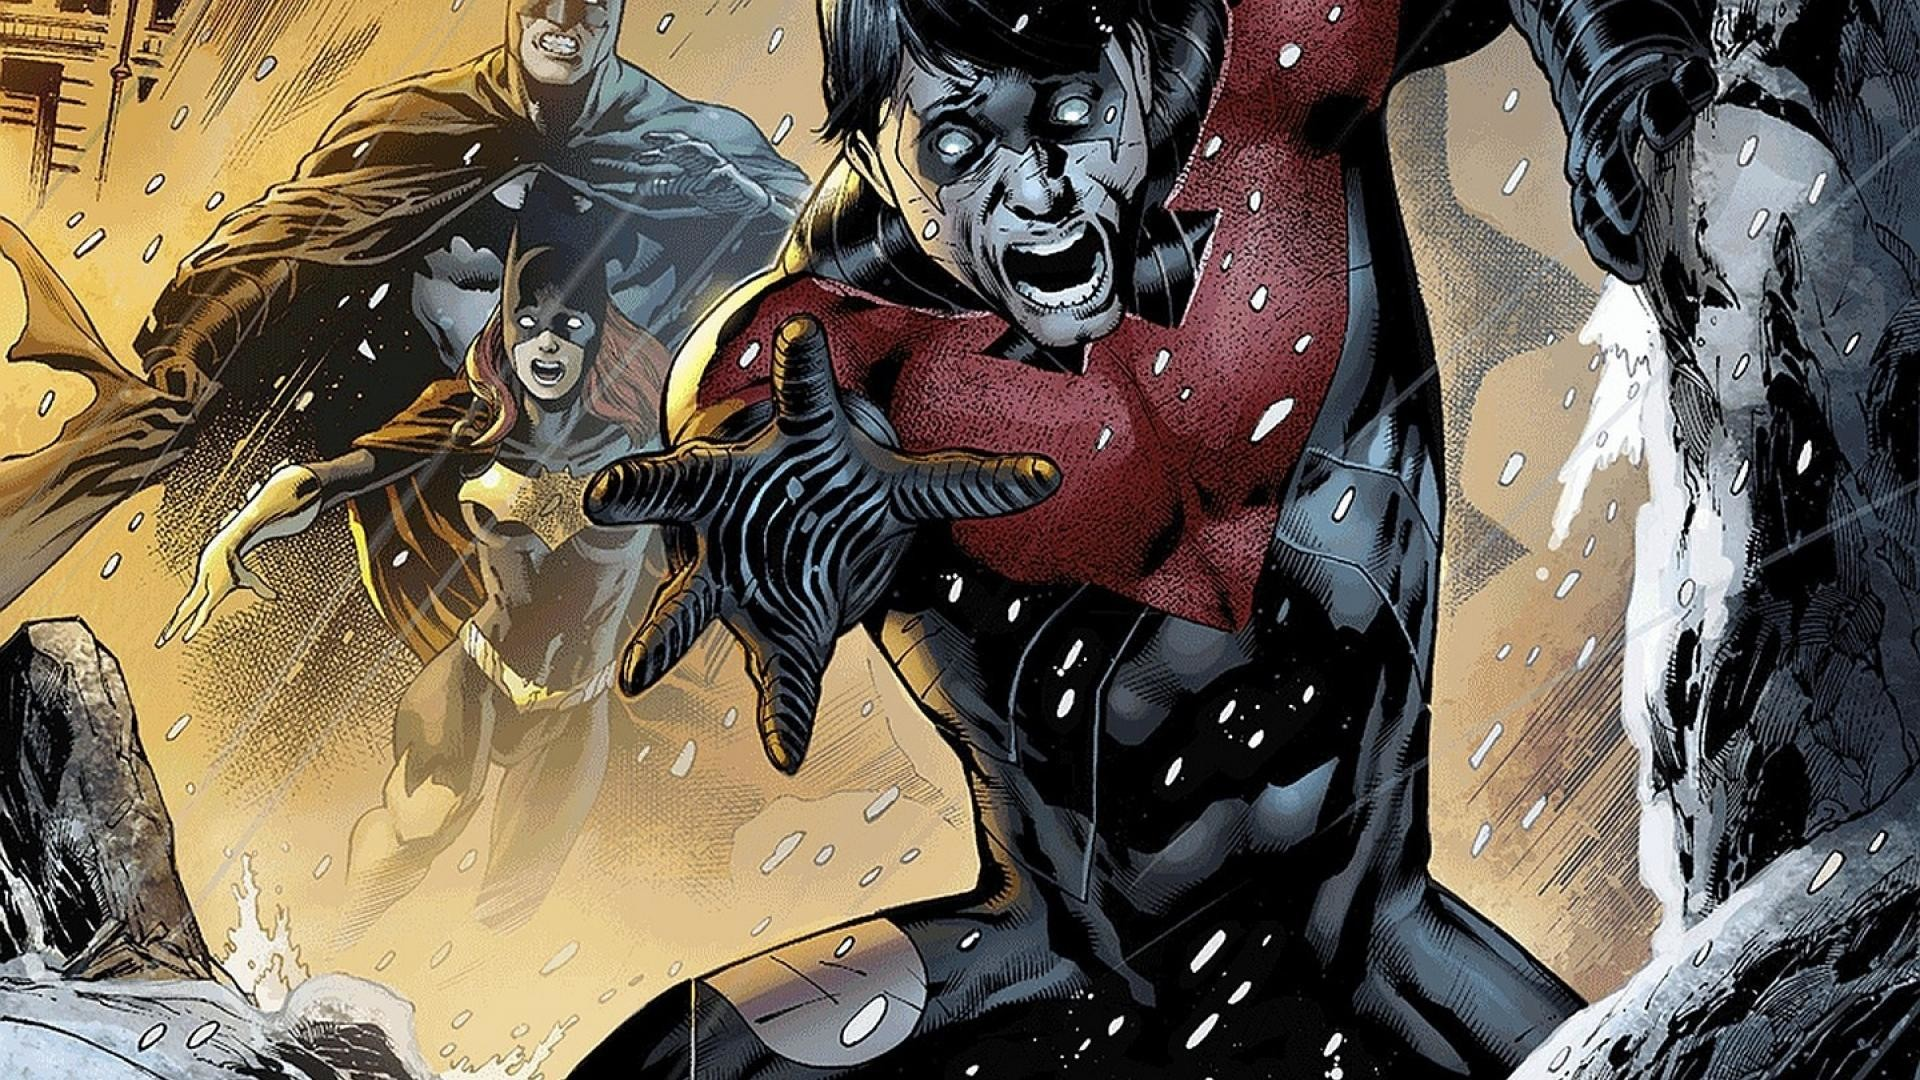 Batman dc comics batgirl nightwing wallpaper | (43945)